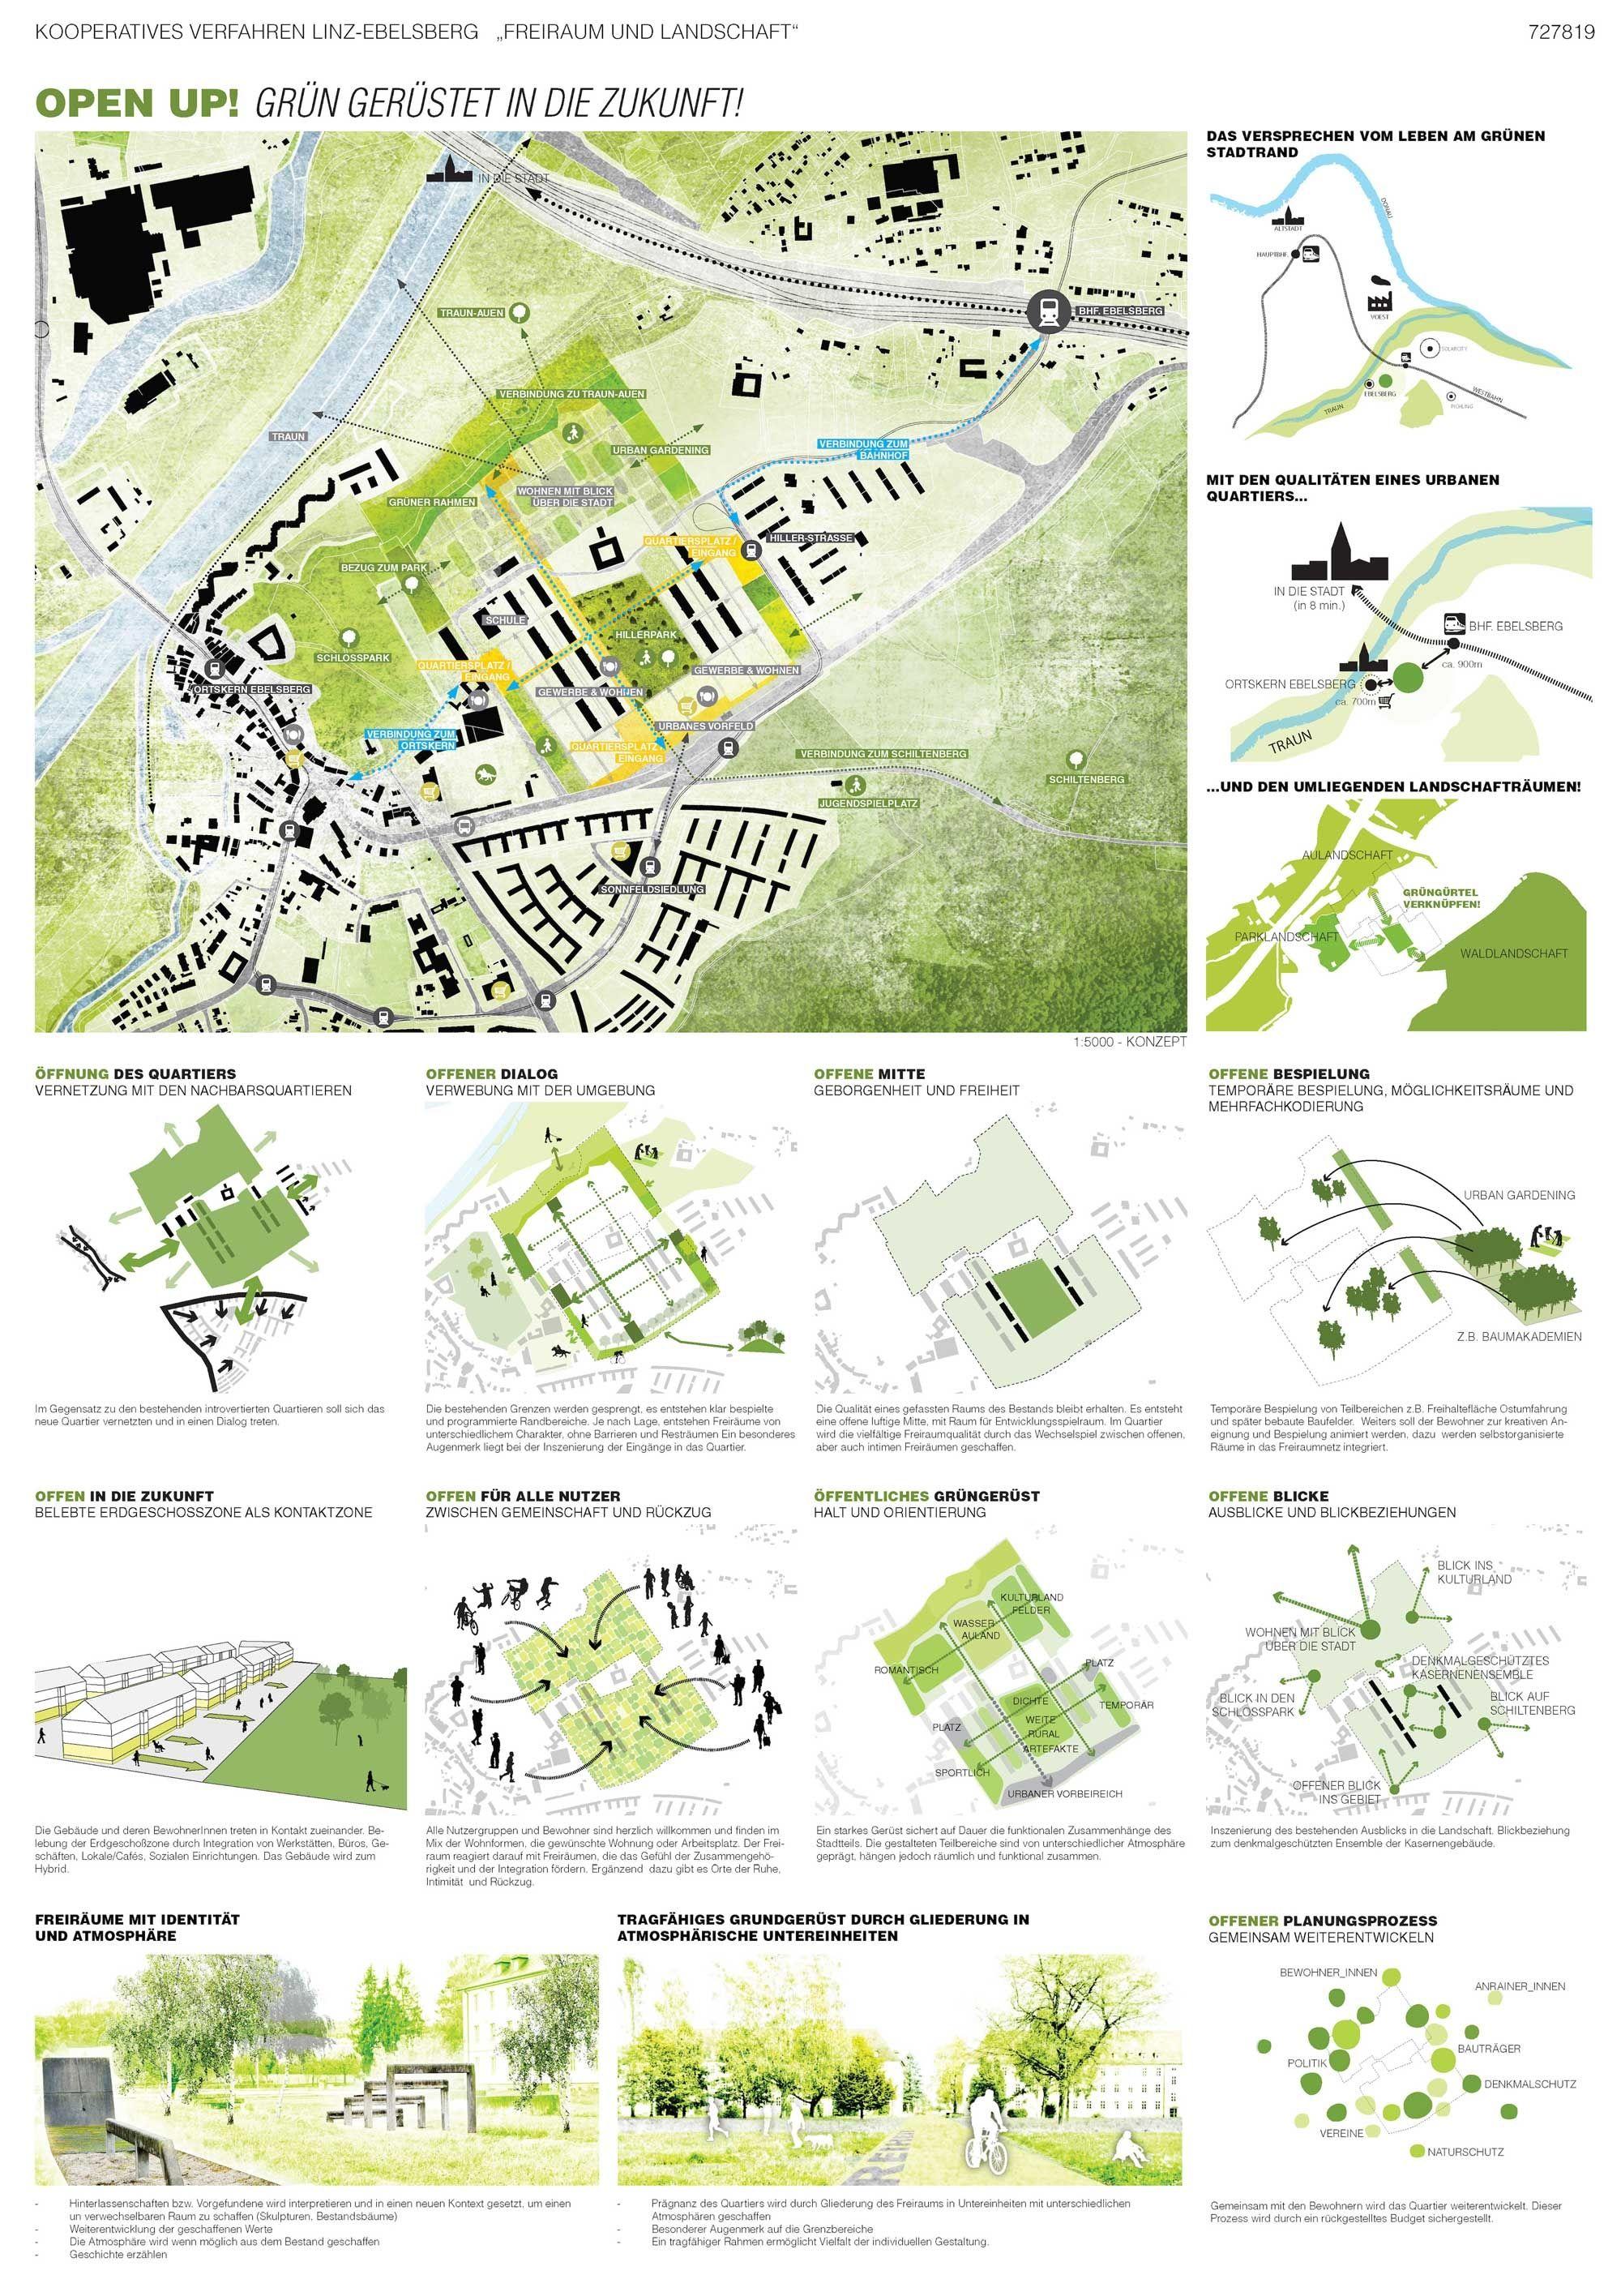 Ergebnis: Kooperatives Verfahren Linz-Ebelsberg...competitionline